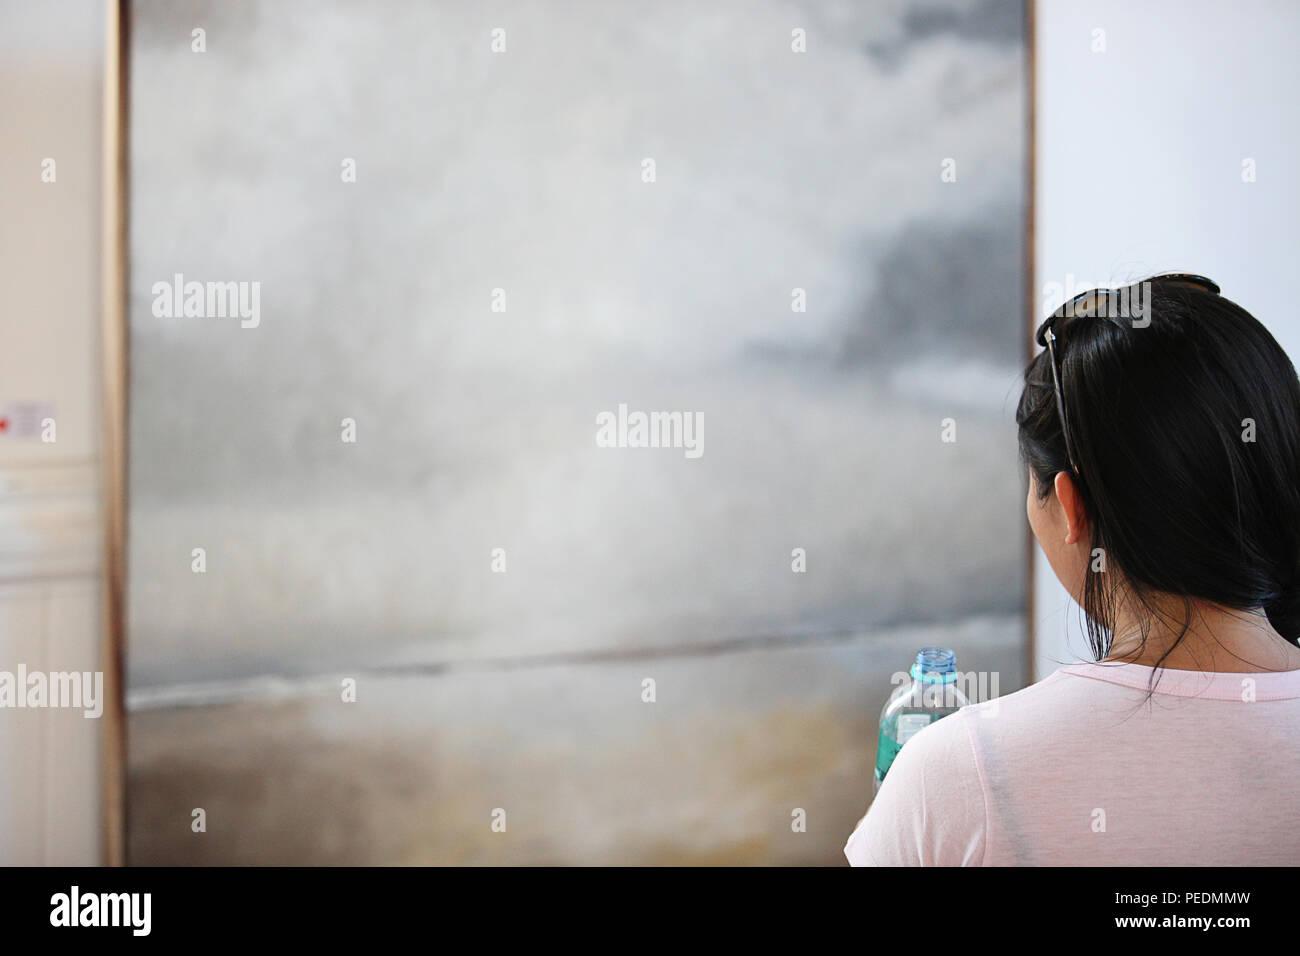 woman admiring art - Stock Image